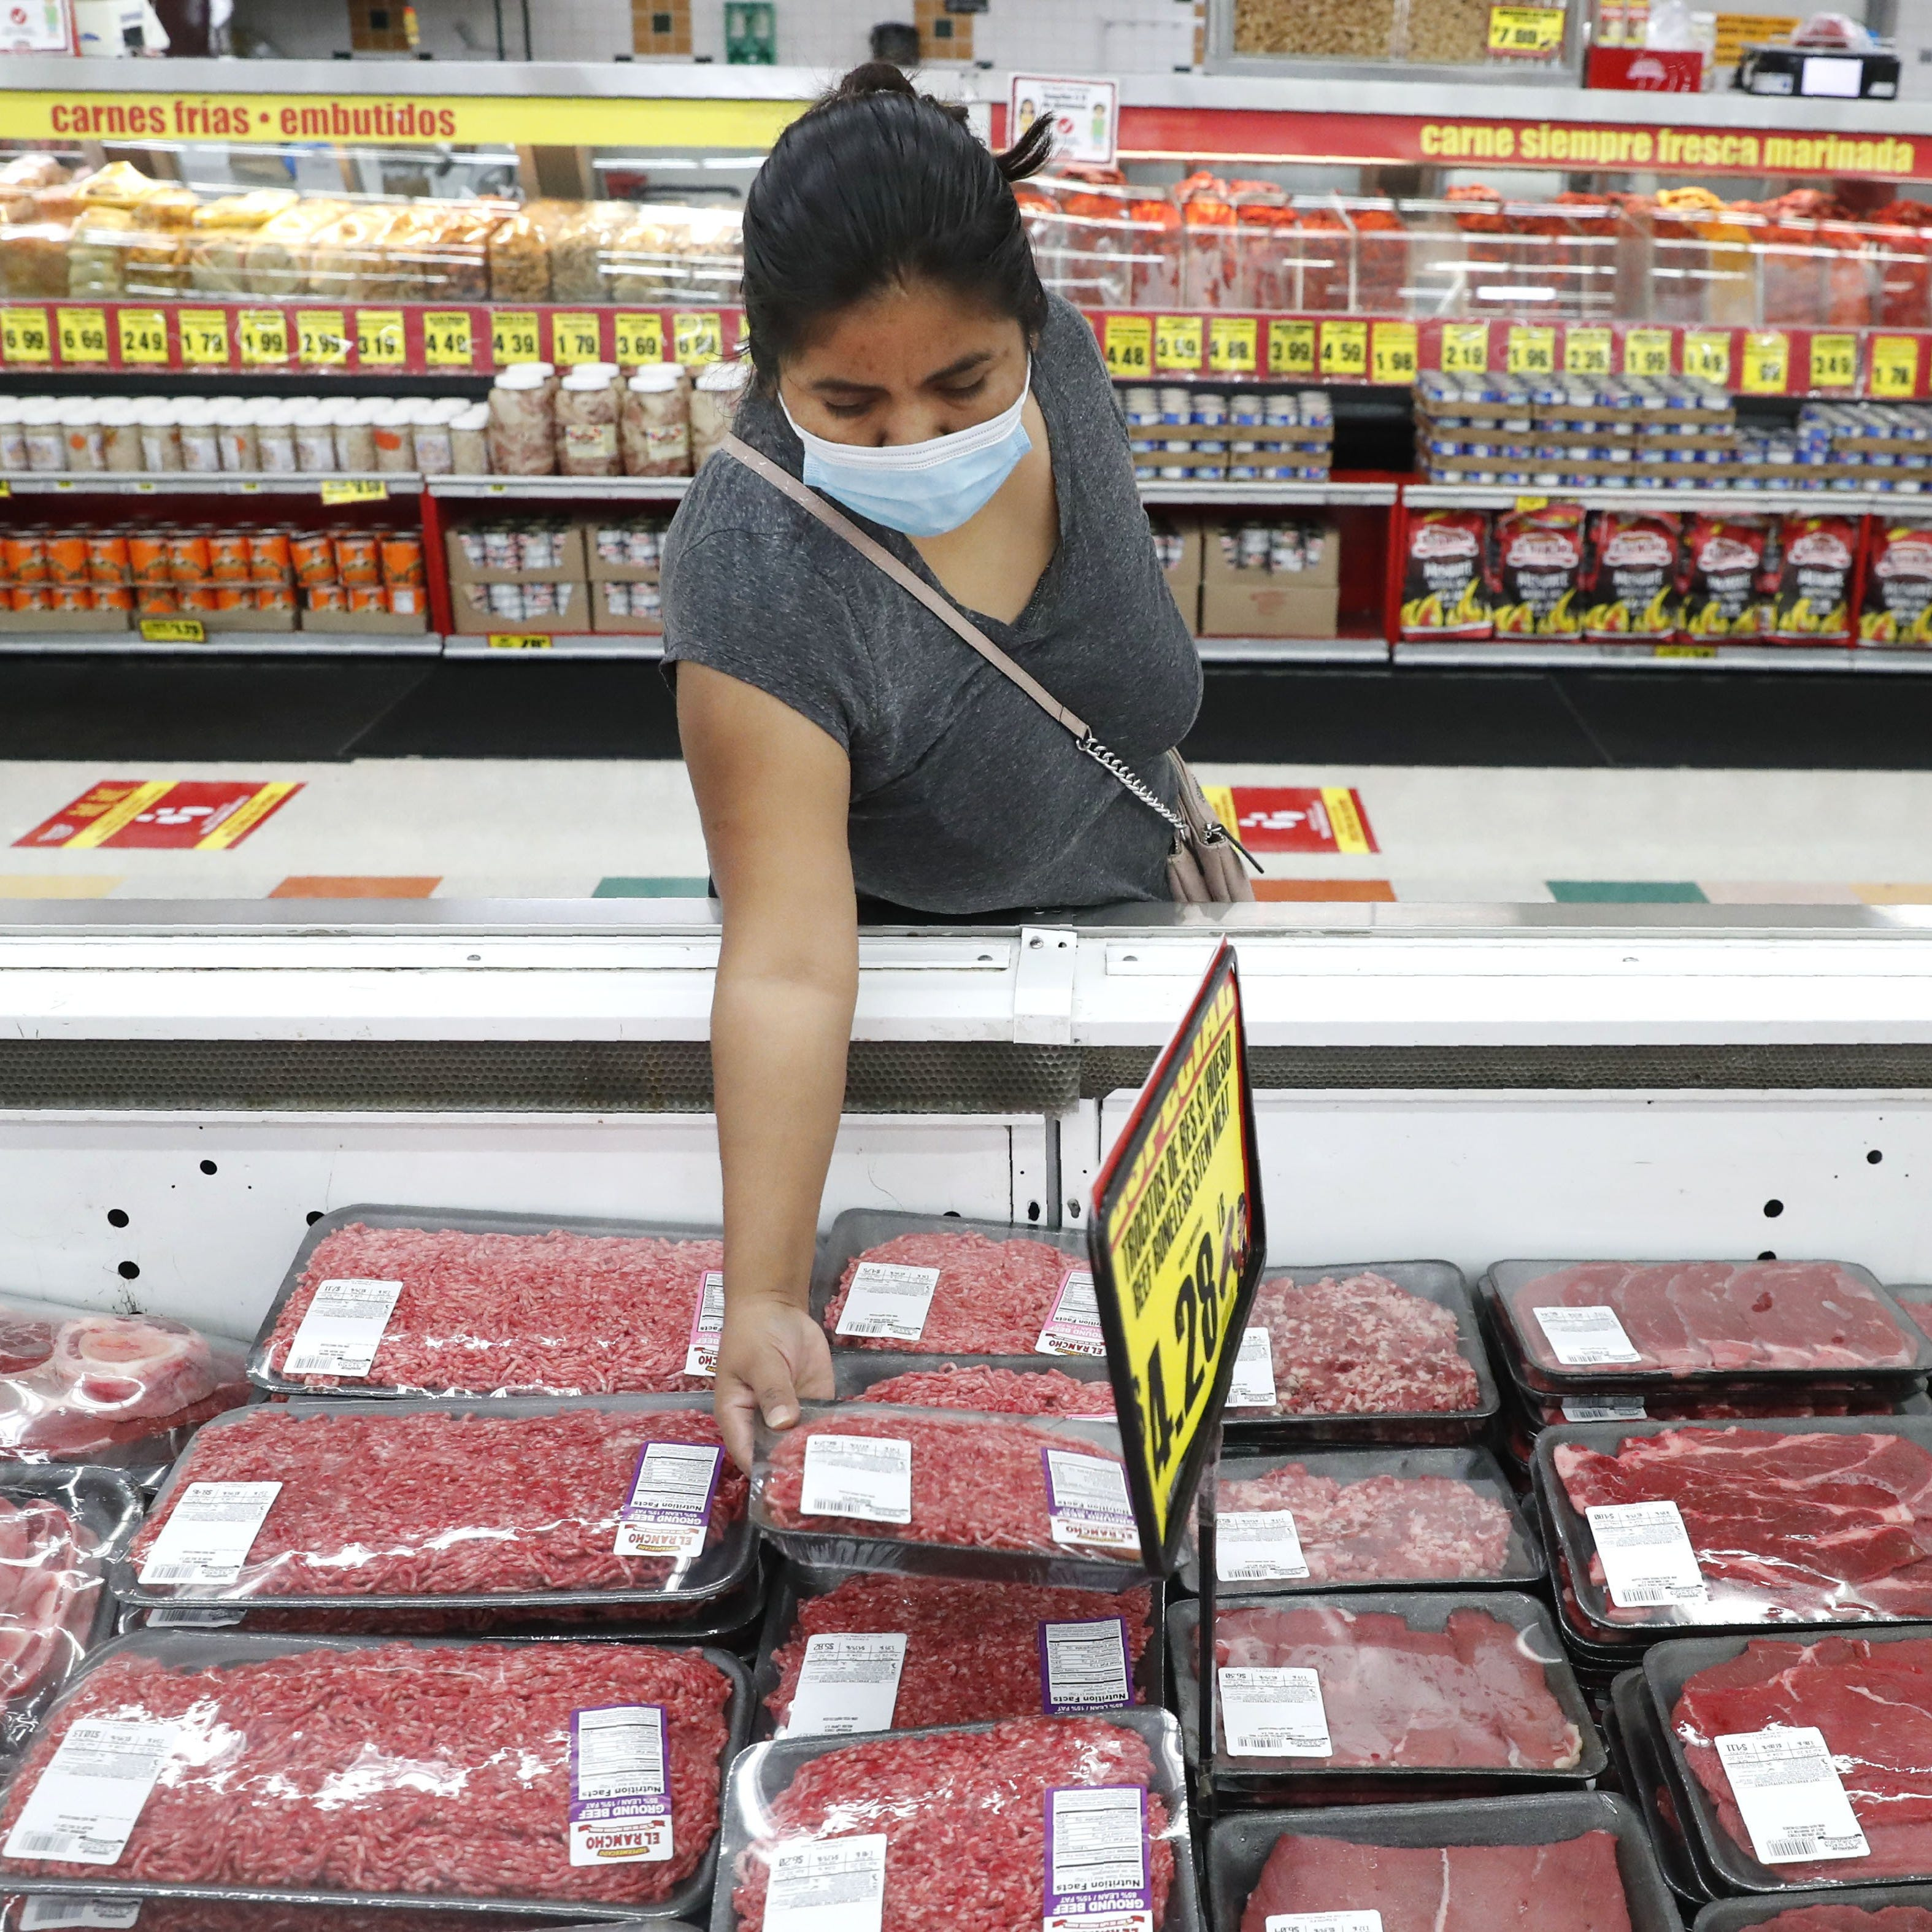 Fresh Market Slc Hours Christmas Day 2021 Bu0yquoxaqi1m